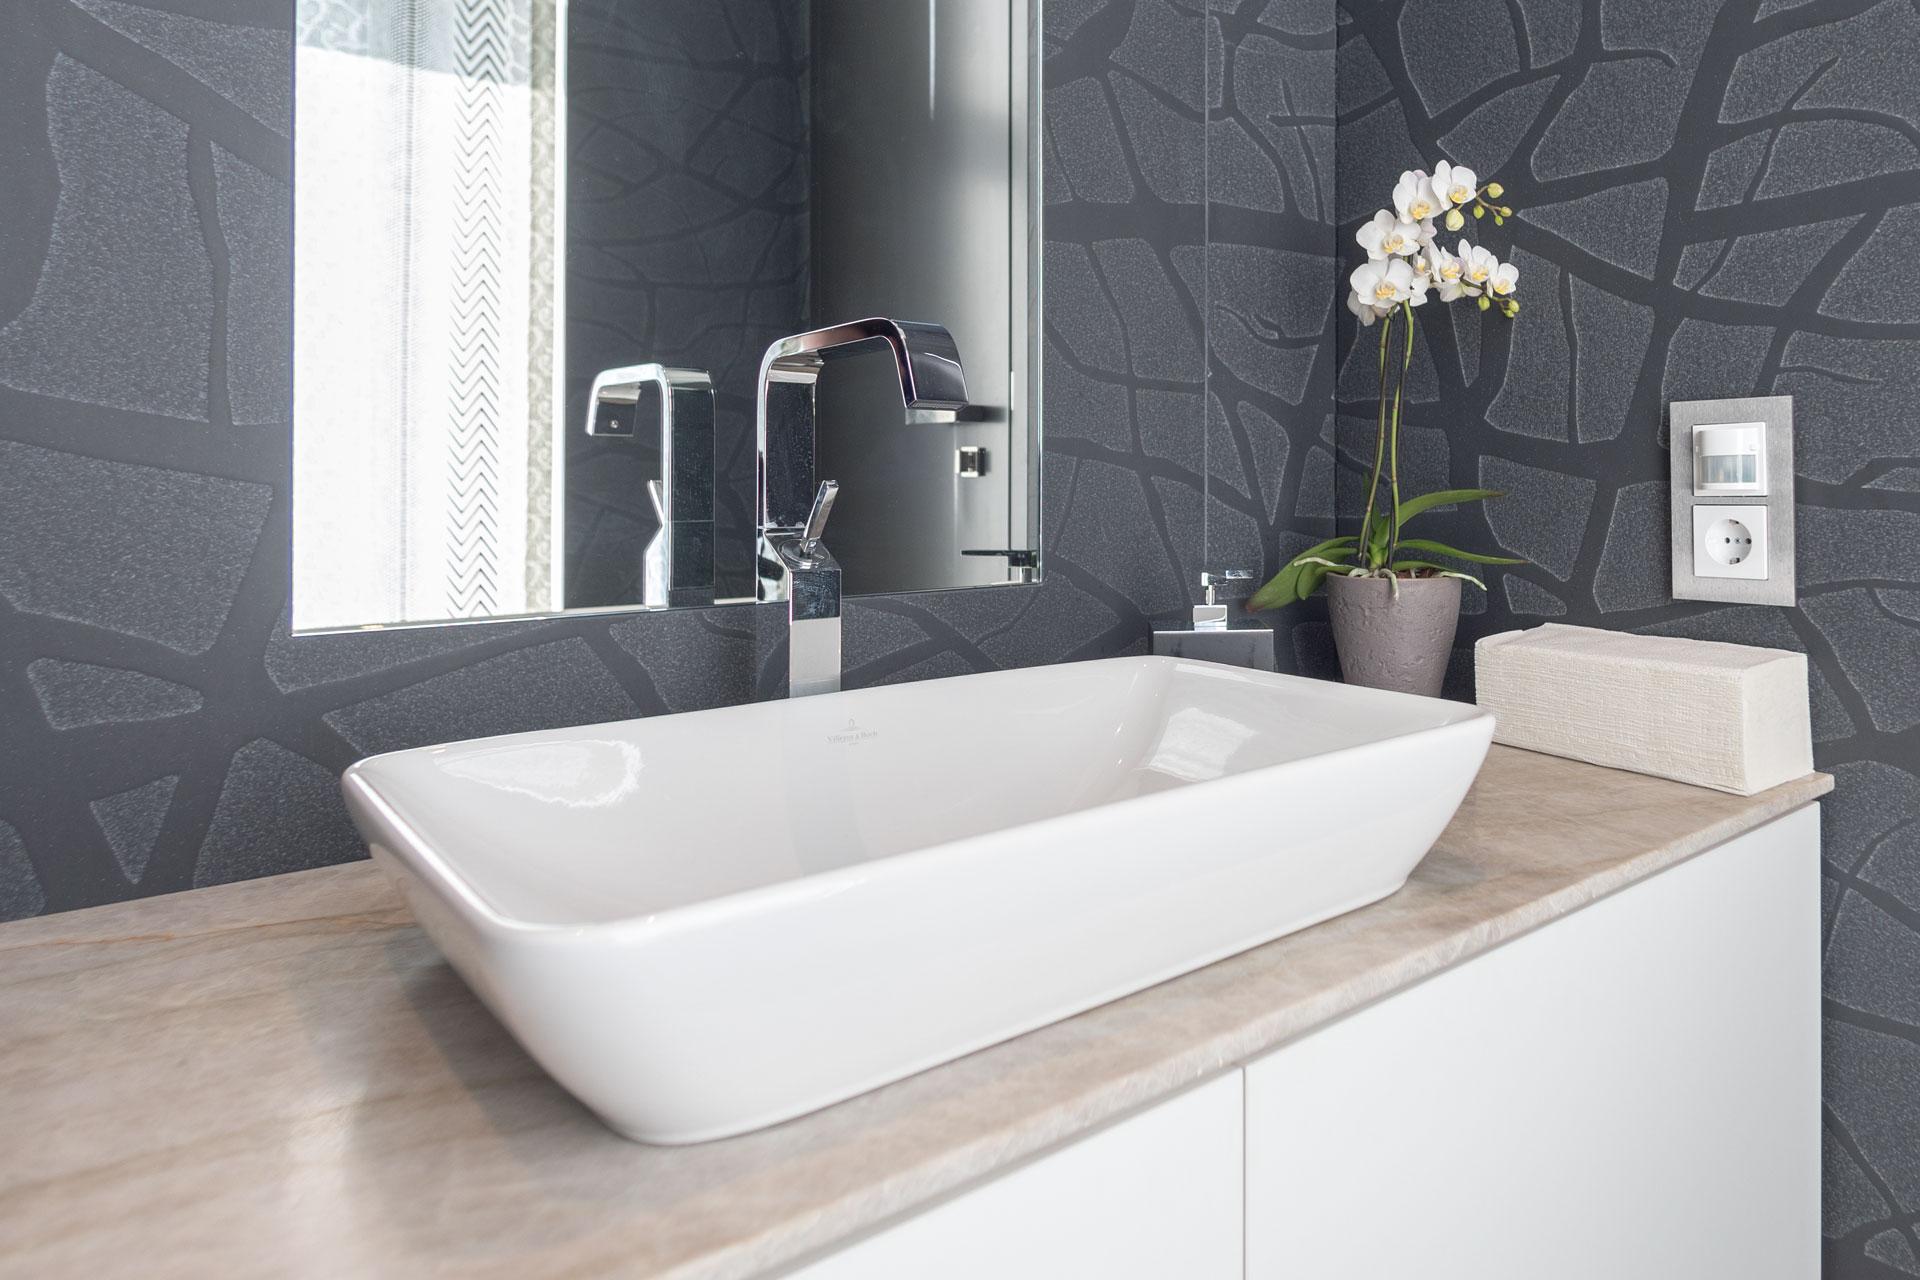 Badstudio Nagold: Individuelle Badezimmer in Nagold, Sindelfingen, Herrenberg und Umgebung